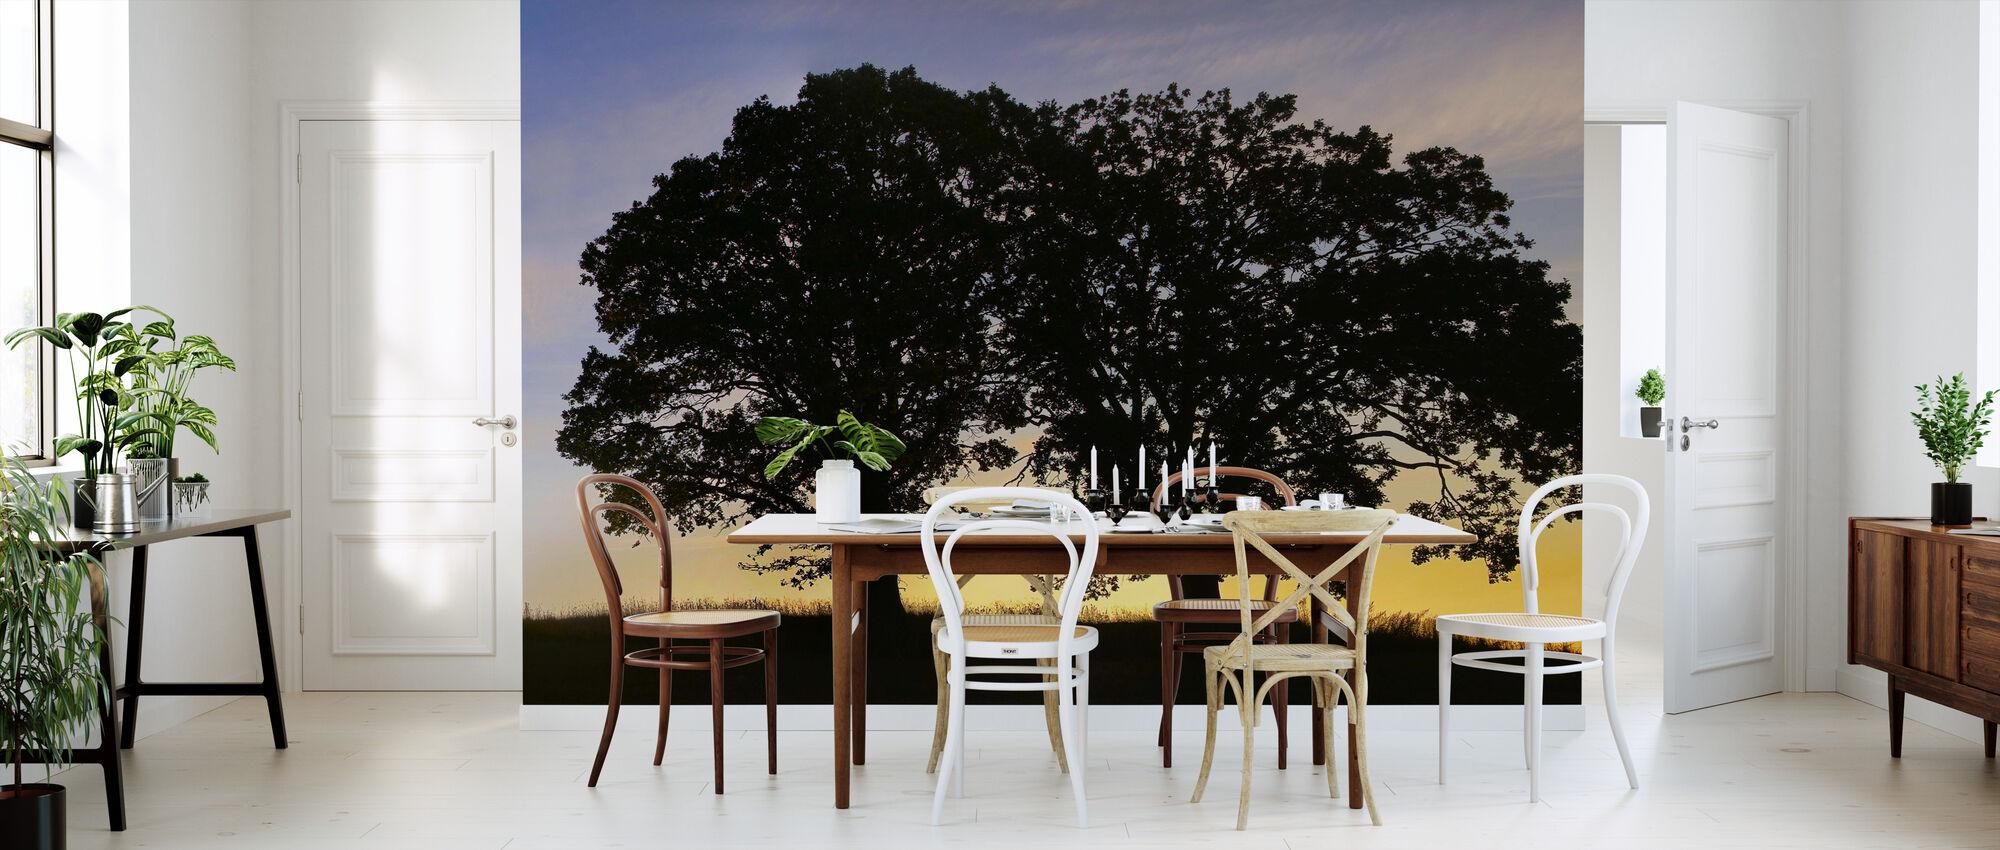 sunset trees mit fototapeten einrichten photowall. Black Bedroom Furniture Sets. Home Design Ideas